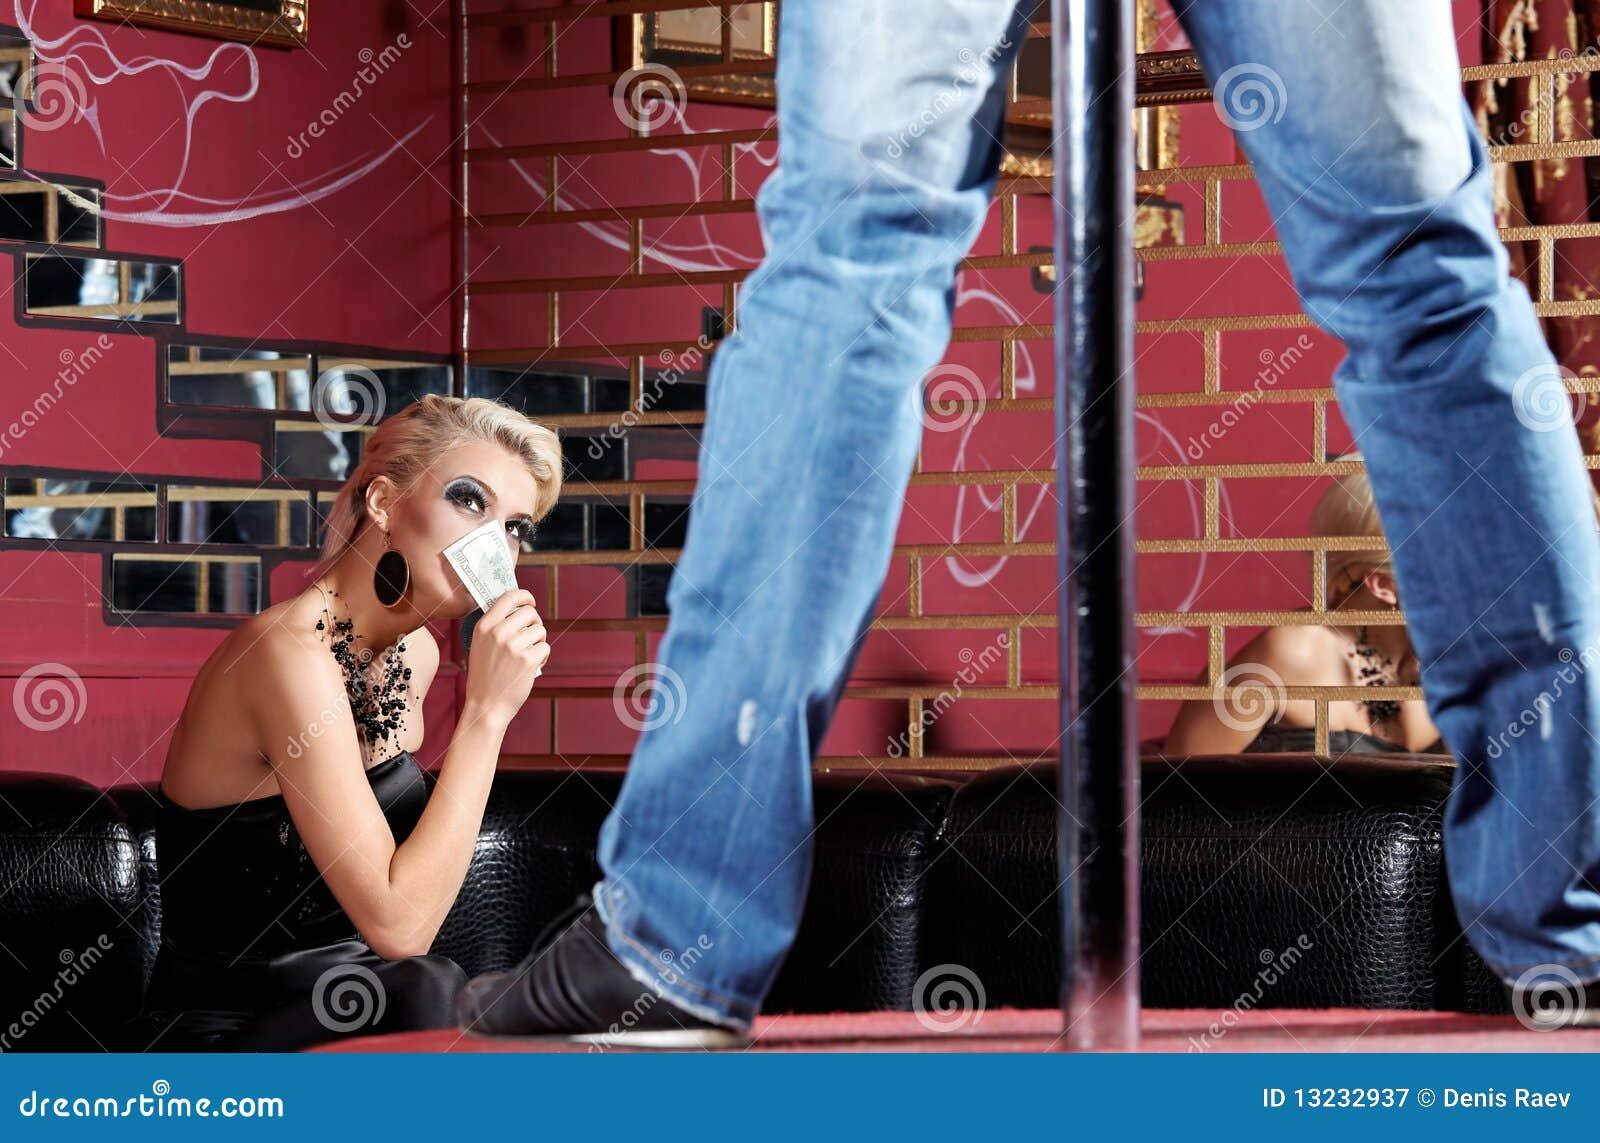 strip tease pour la femme image stock image du haut 13232937. Black Bedroom Furniture Sets. Home Design Ideas